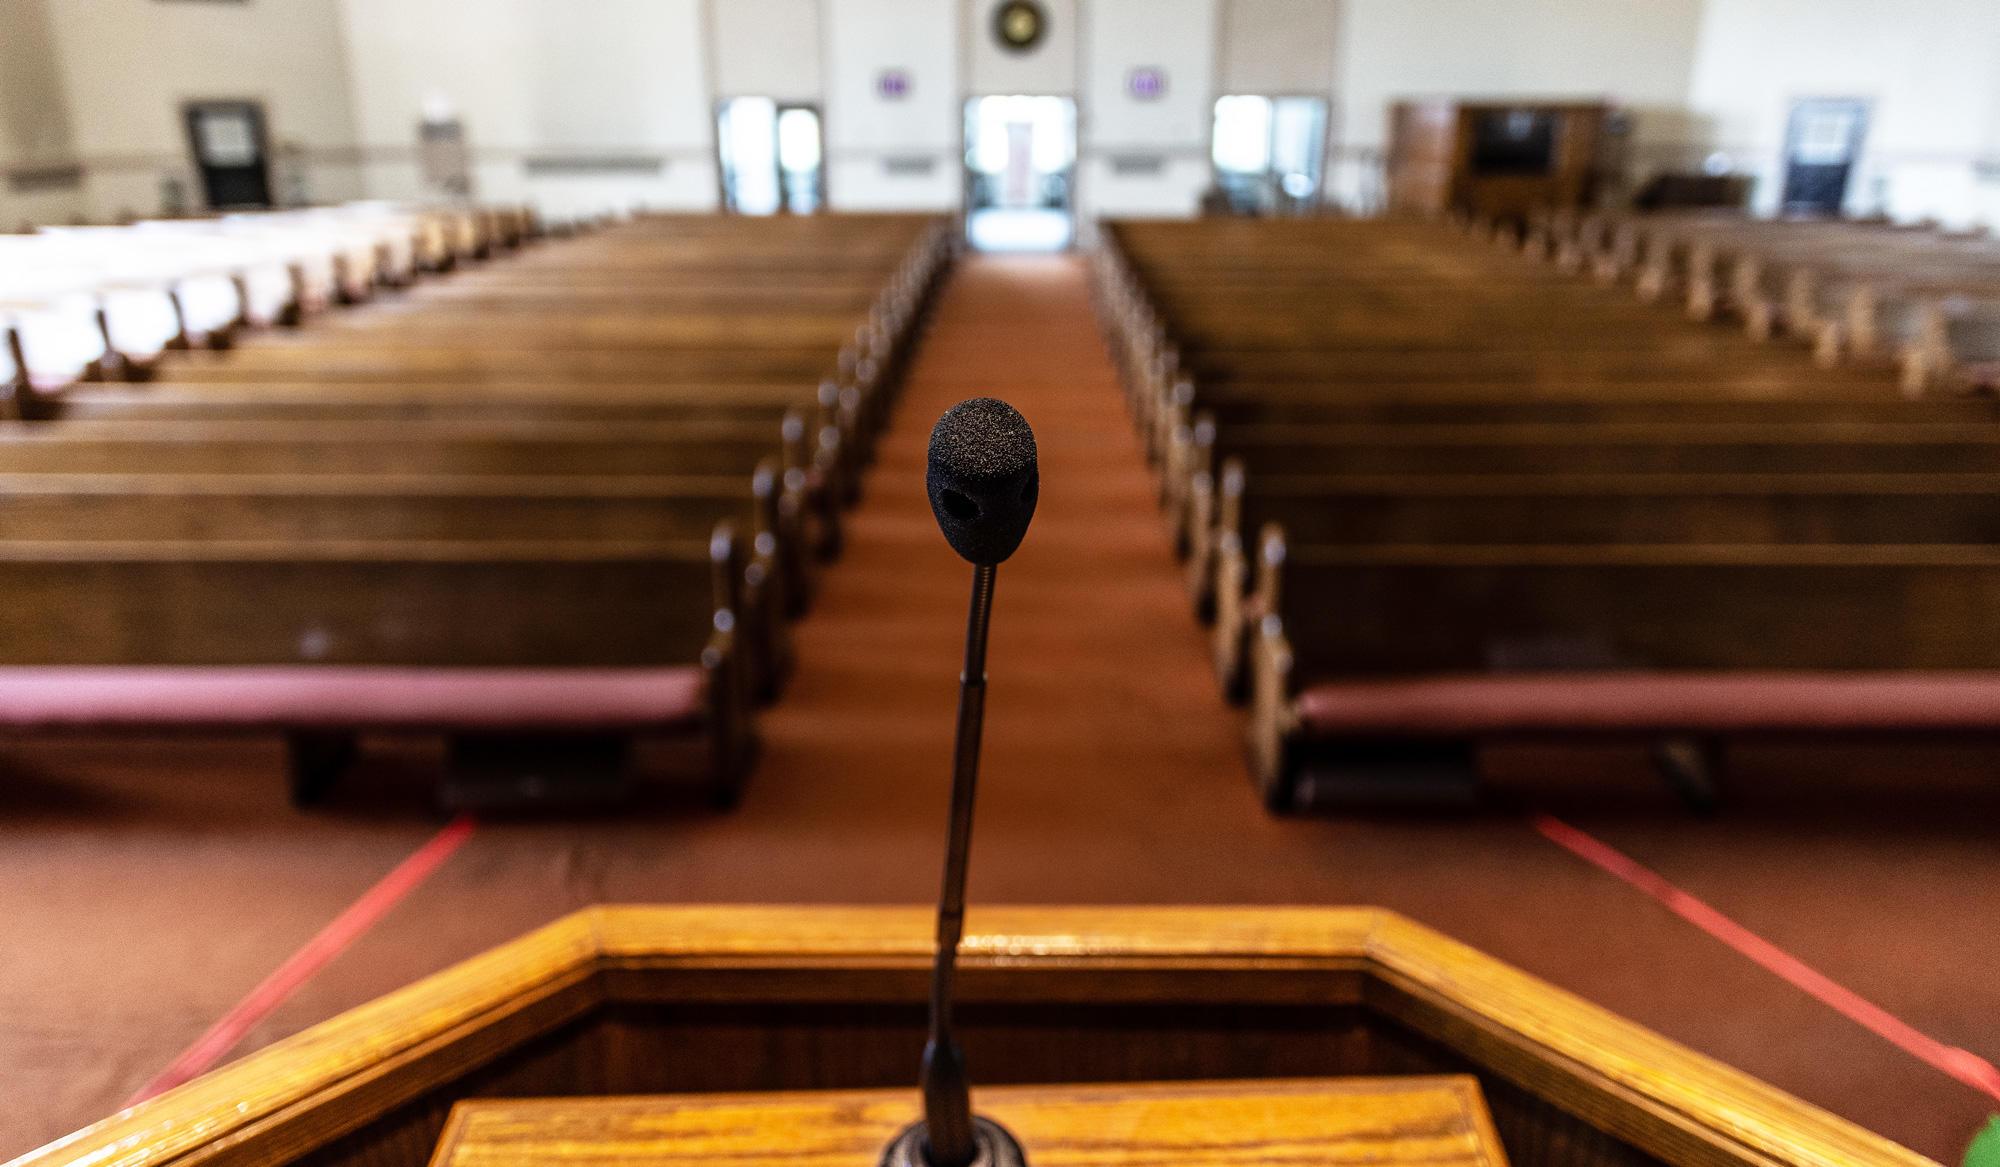 Streik i kirkelig sektor